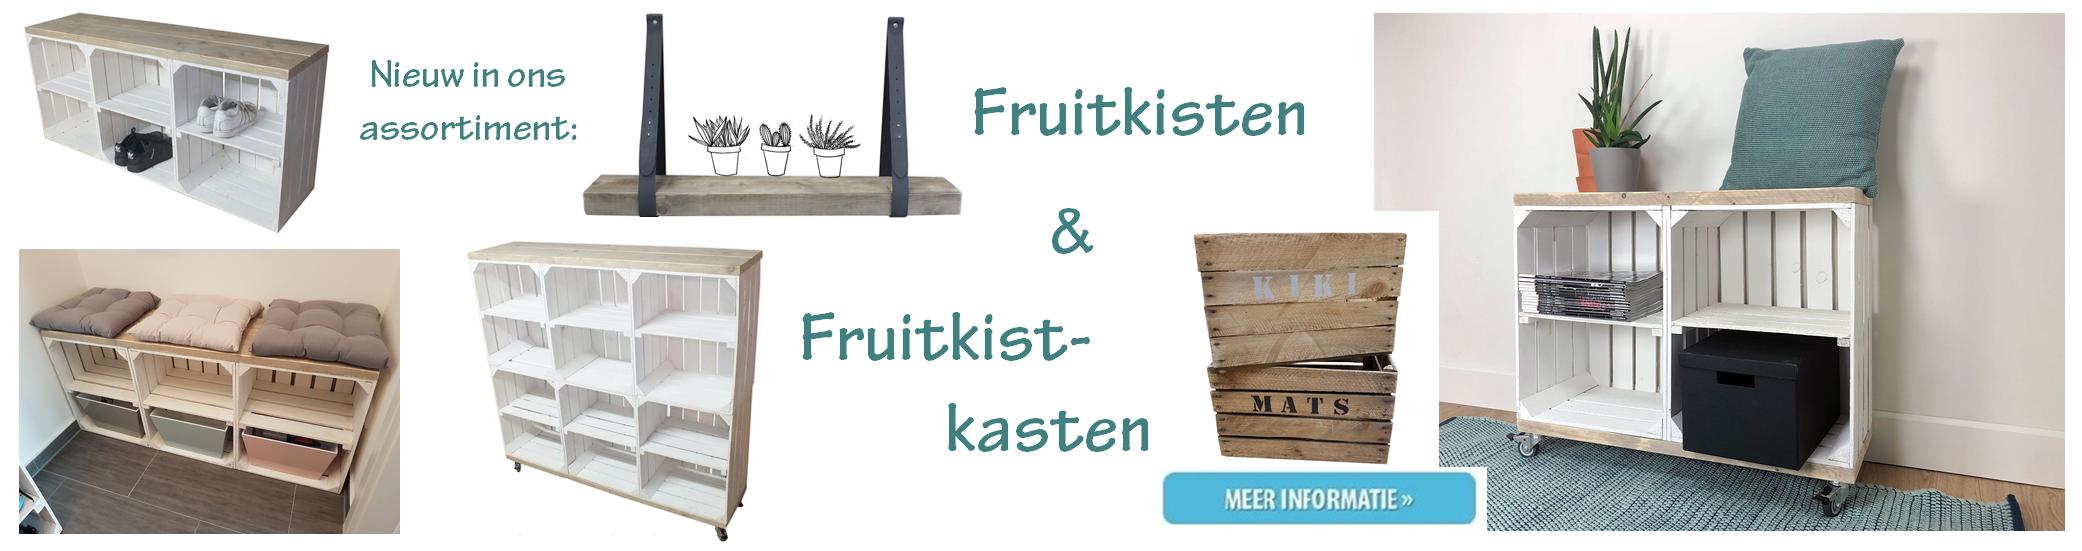 Fruiten & Fruitkistkasten